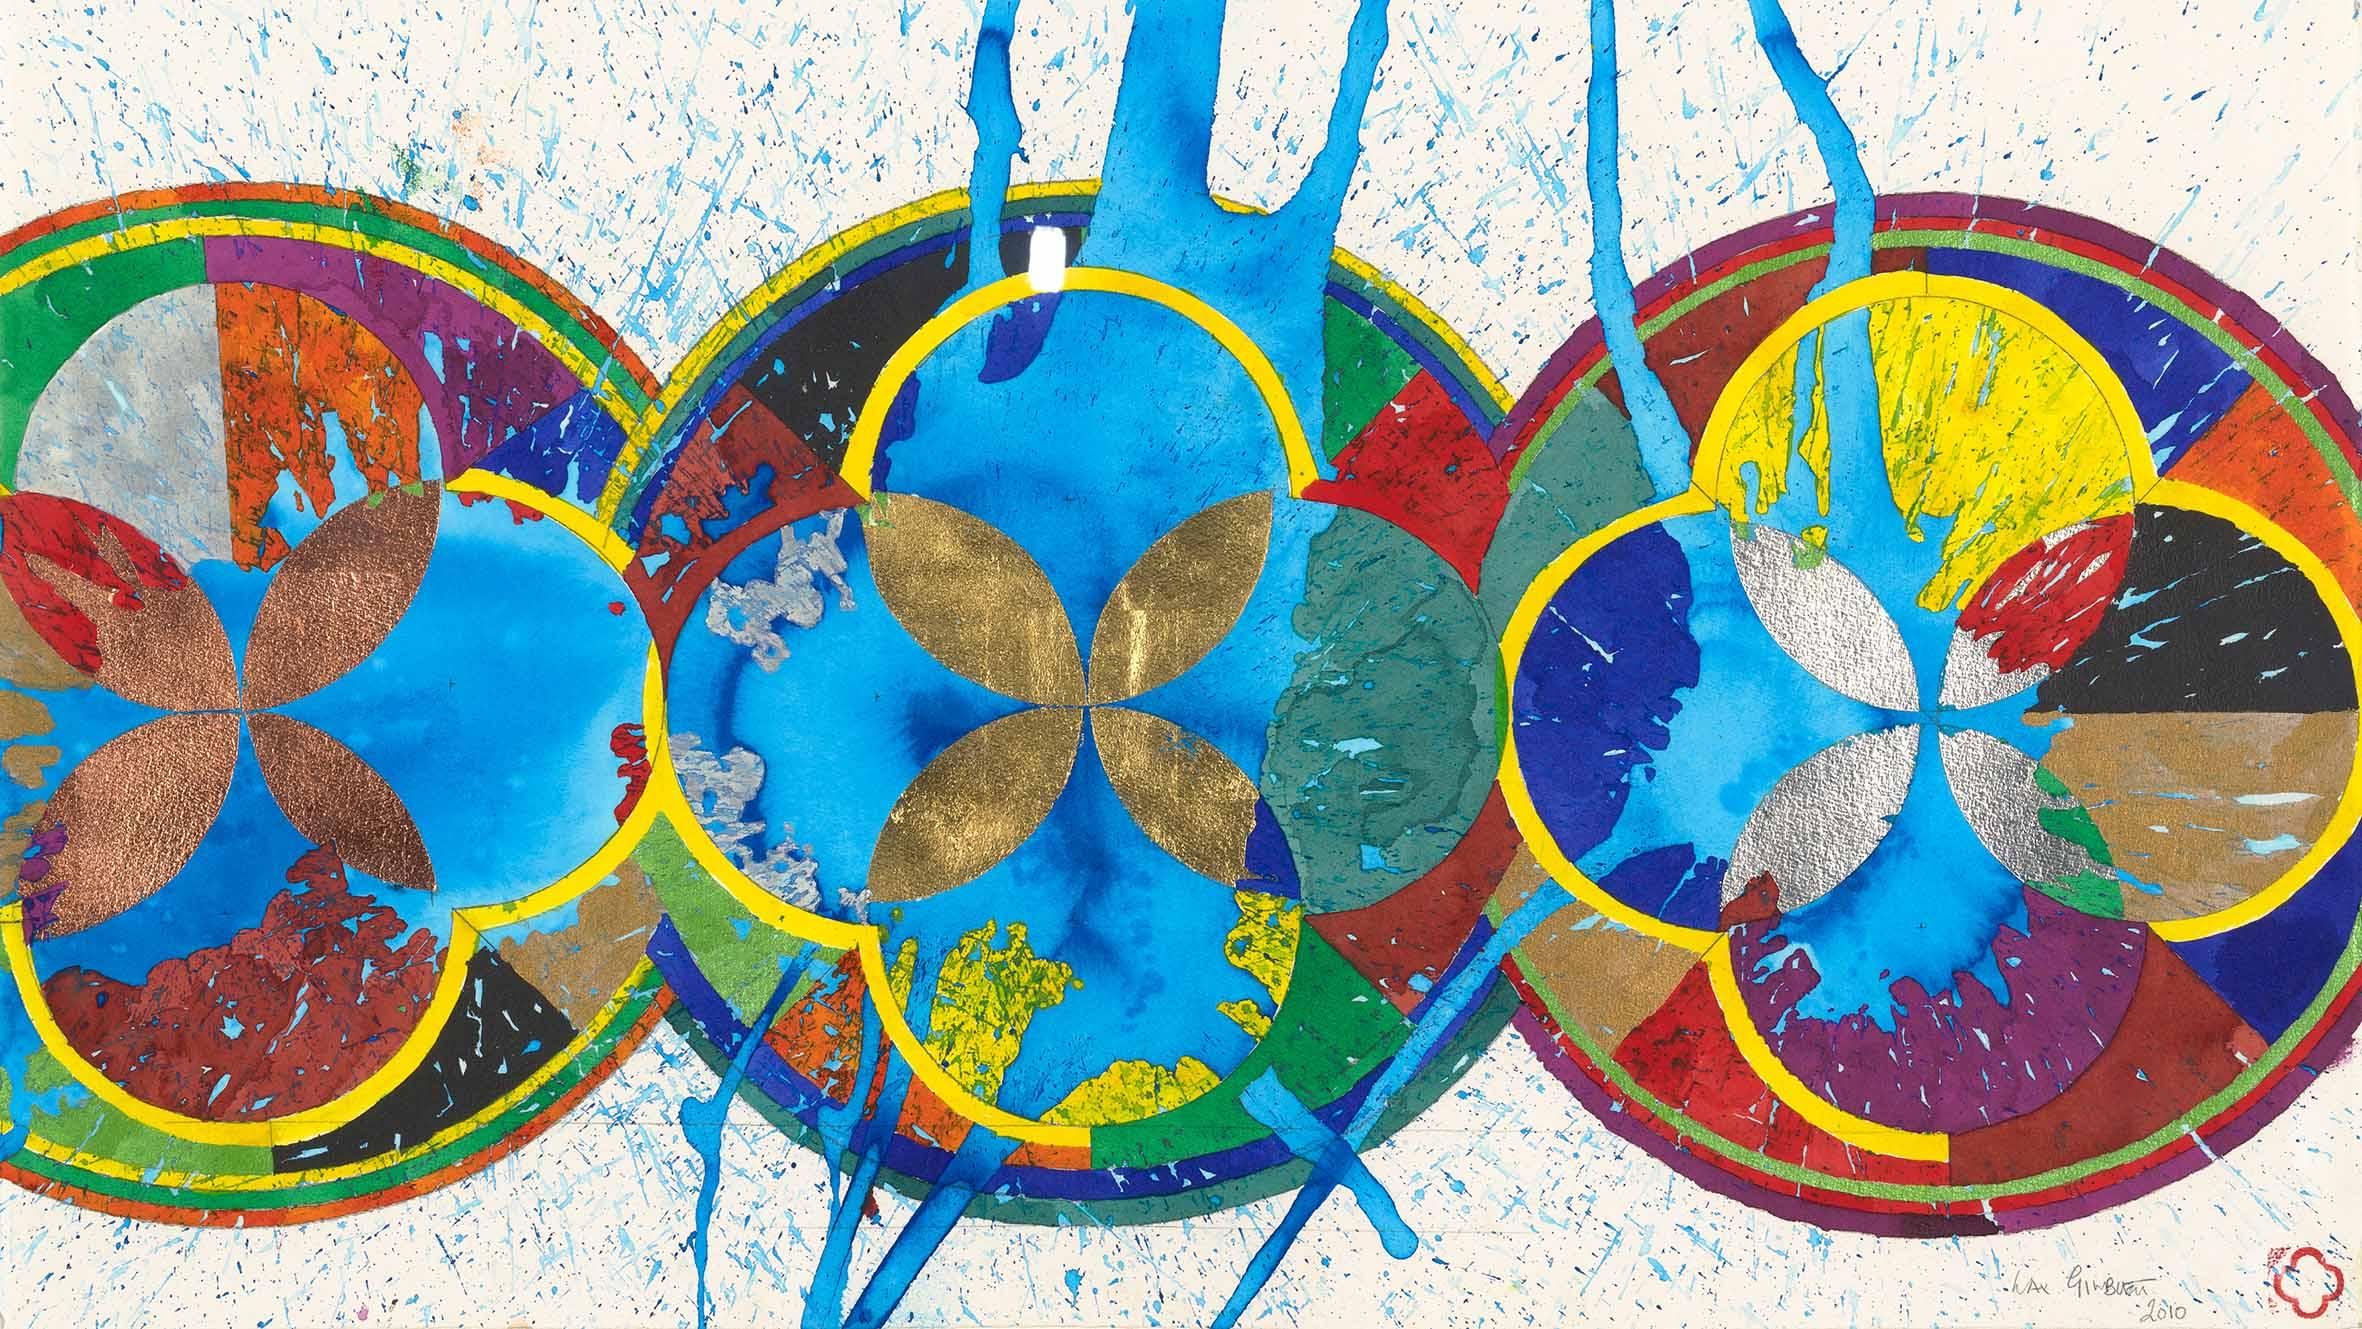 A work from the Max Gimblett and Barbara Kirshenblatt-Gimblett gift. Image: Newsline / CCC